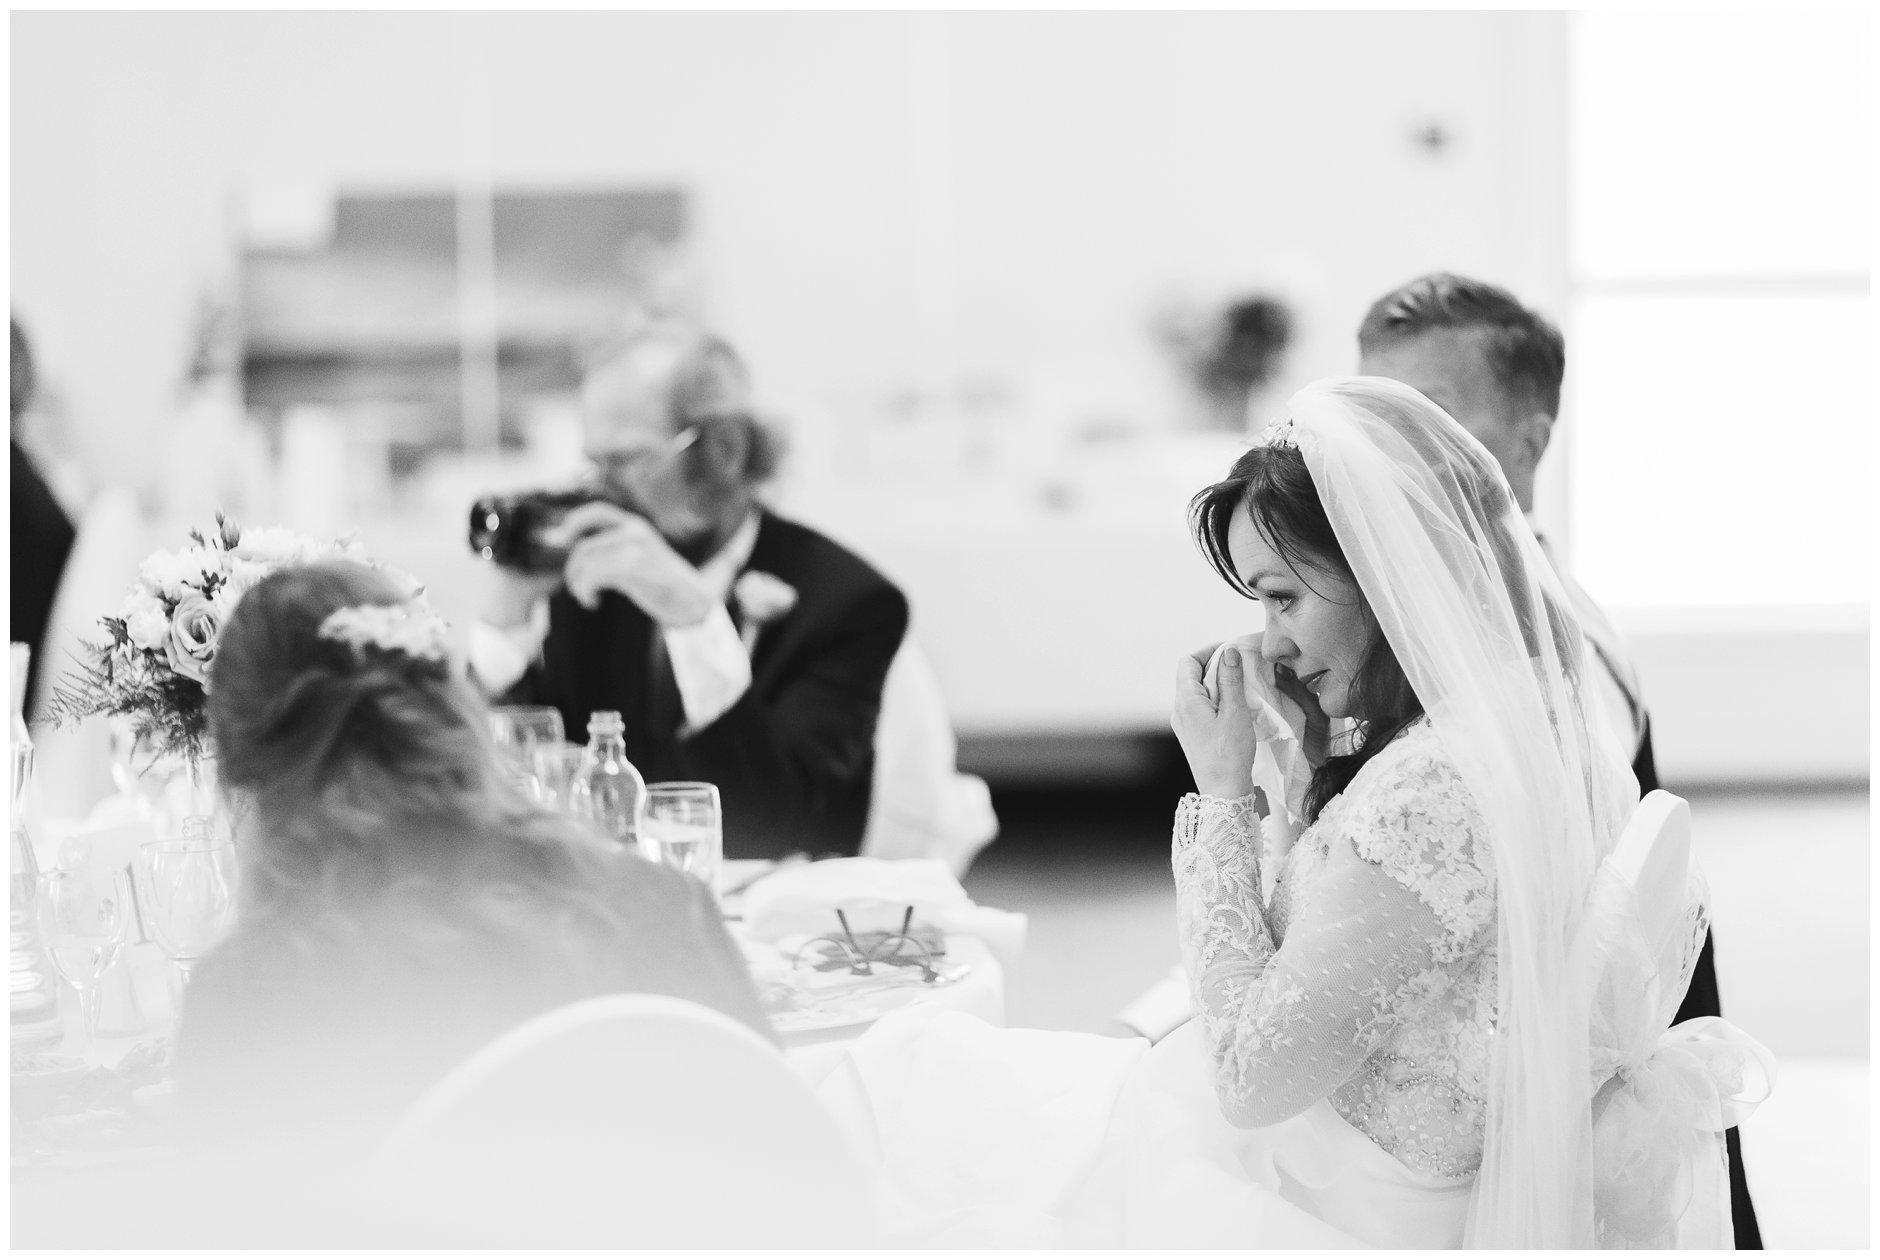 Rørende tale i bryllup på Tjøme